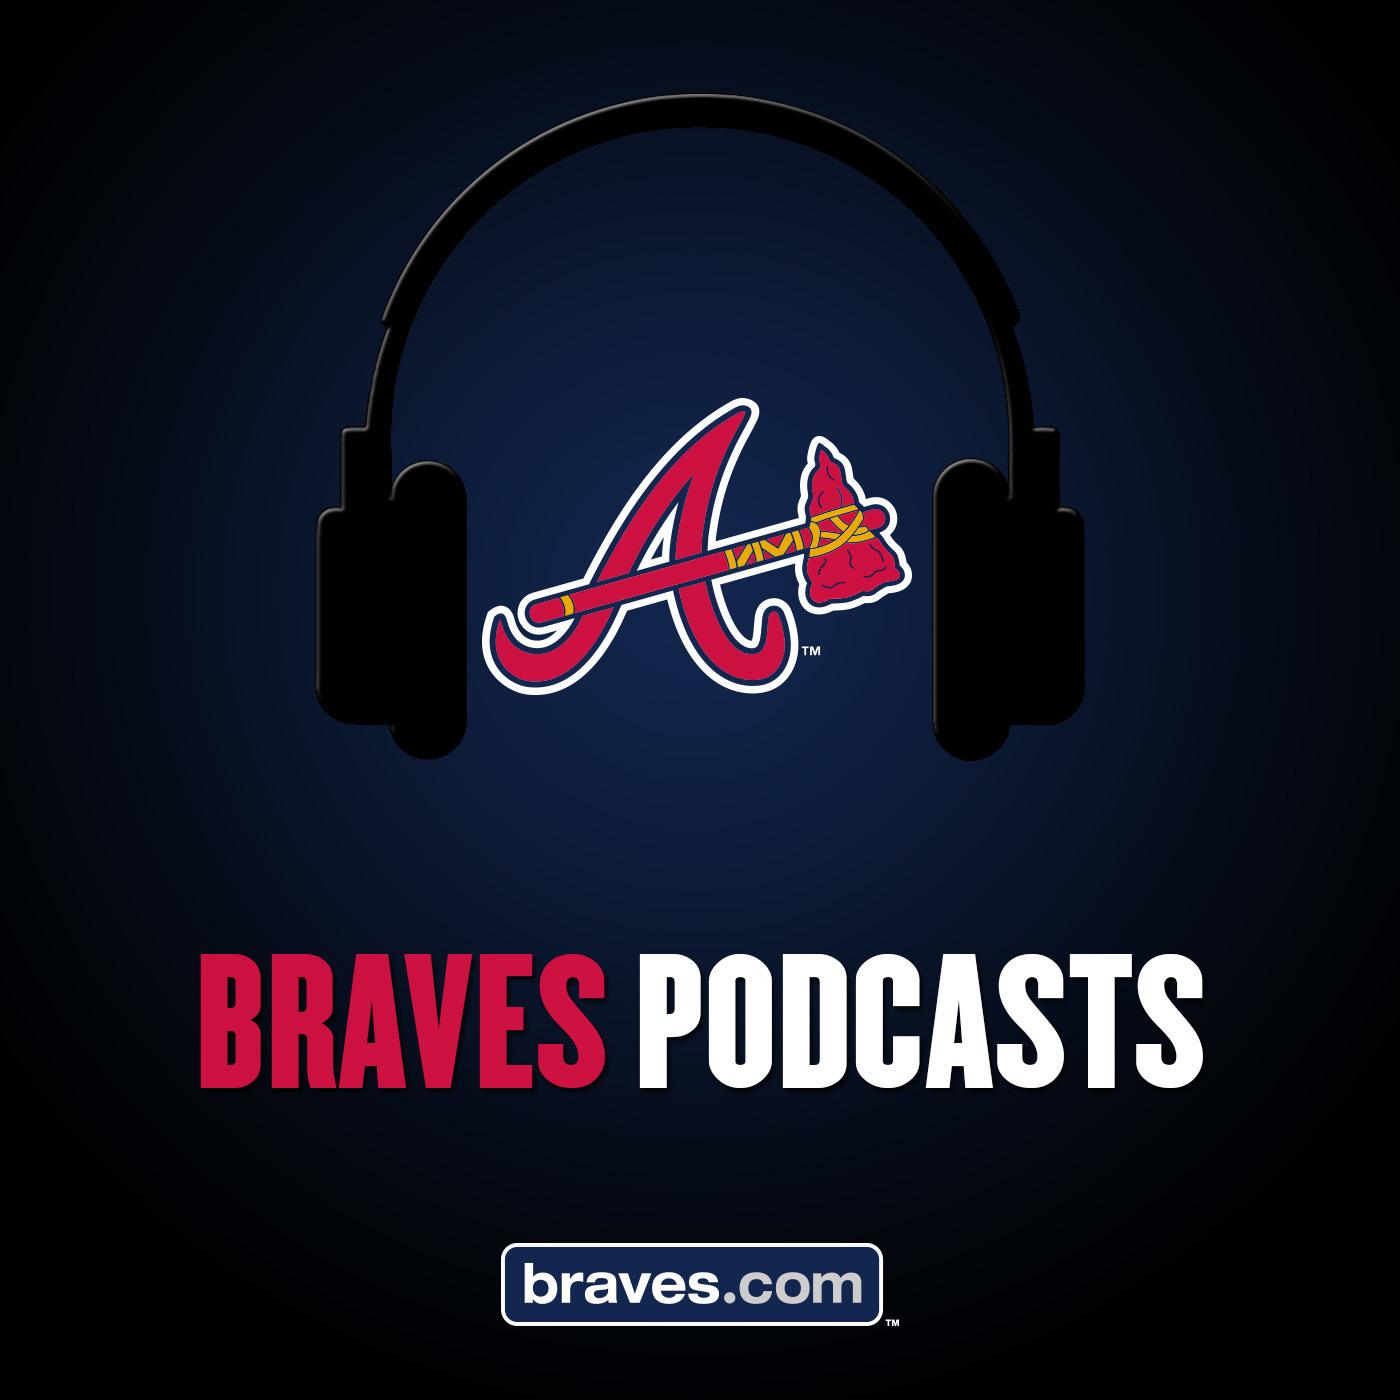 11/29/18: MLB.com Extras | Atlanta Braves